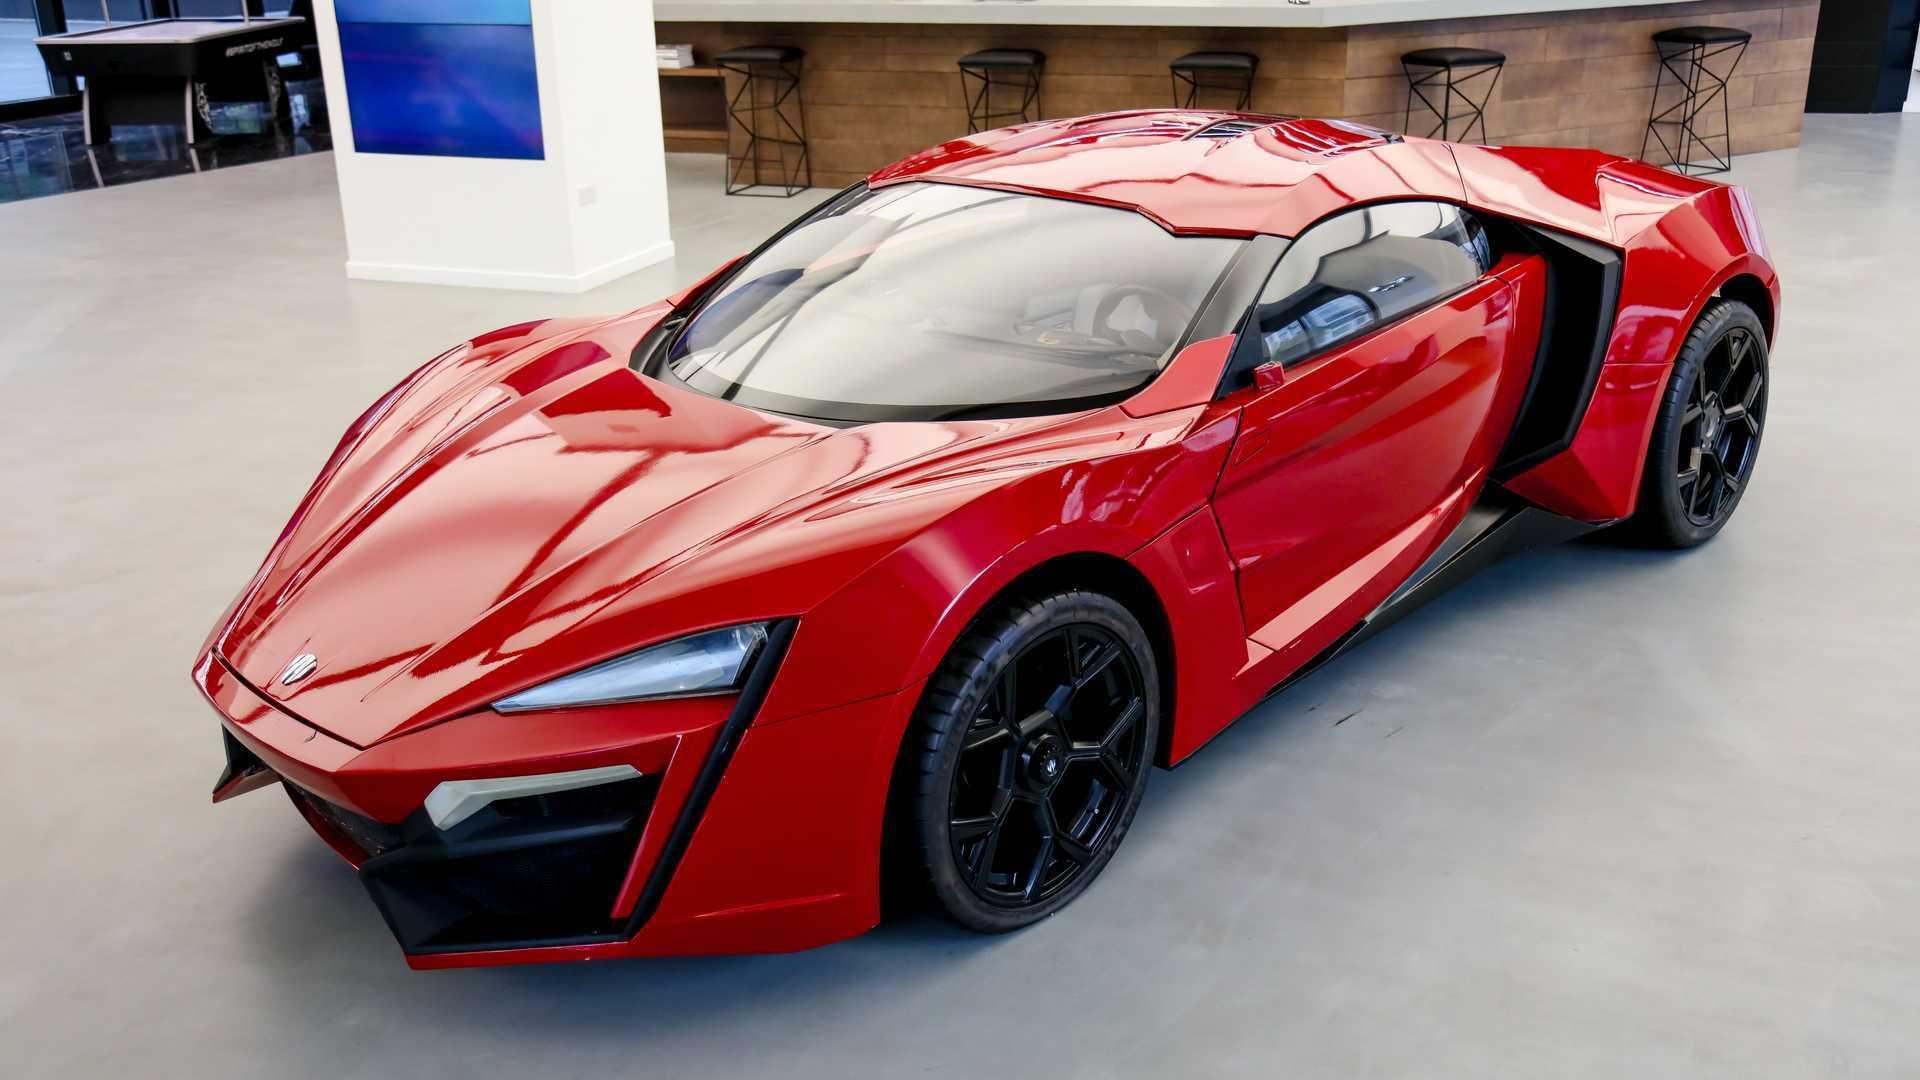 Lykan_HyperSport_stunt_car_sale-0014